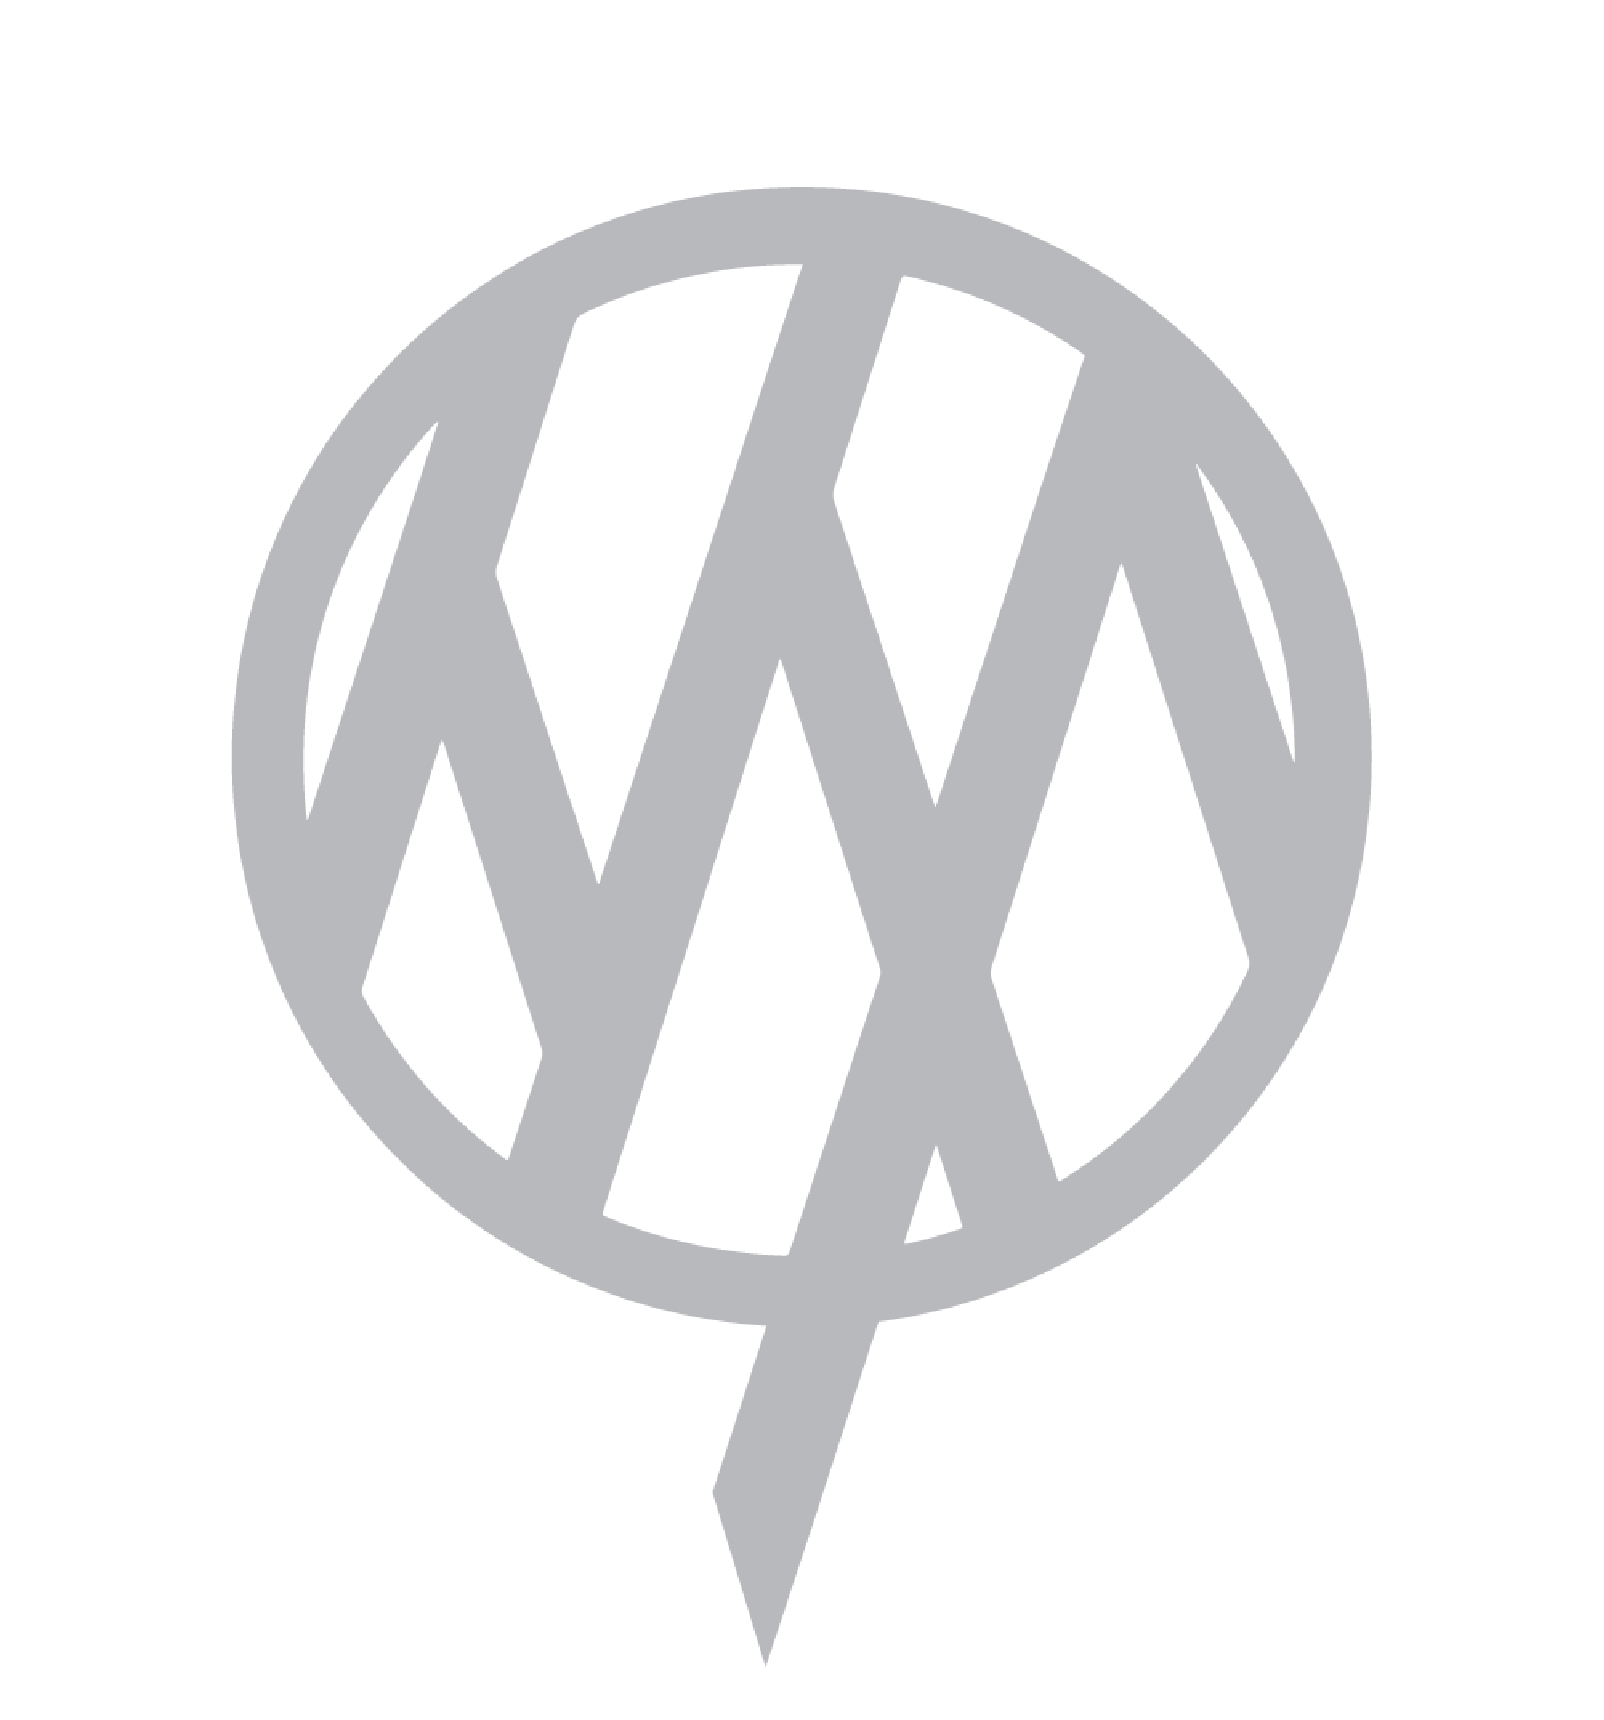 mauvsa-logo.png